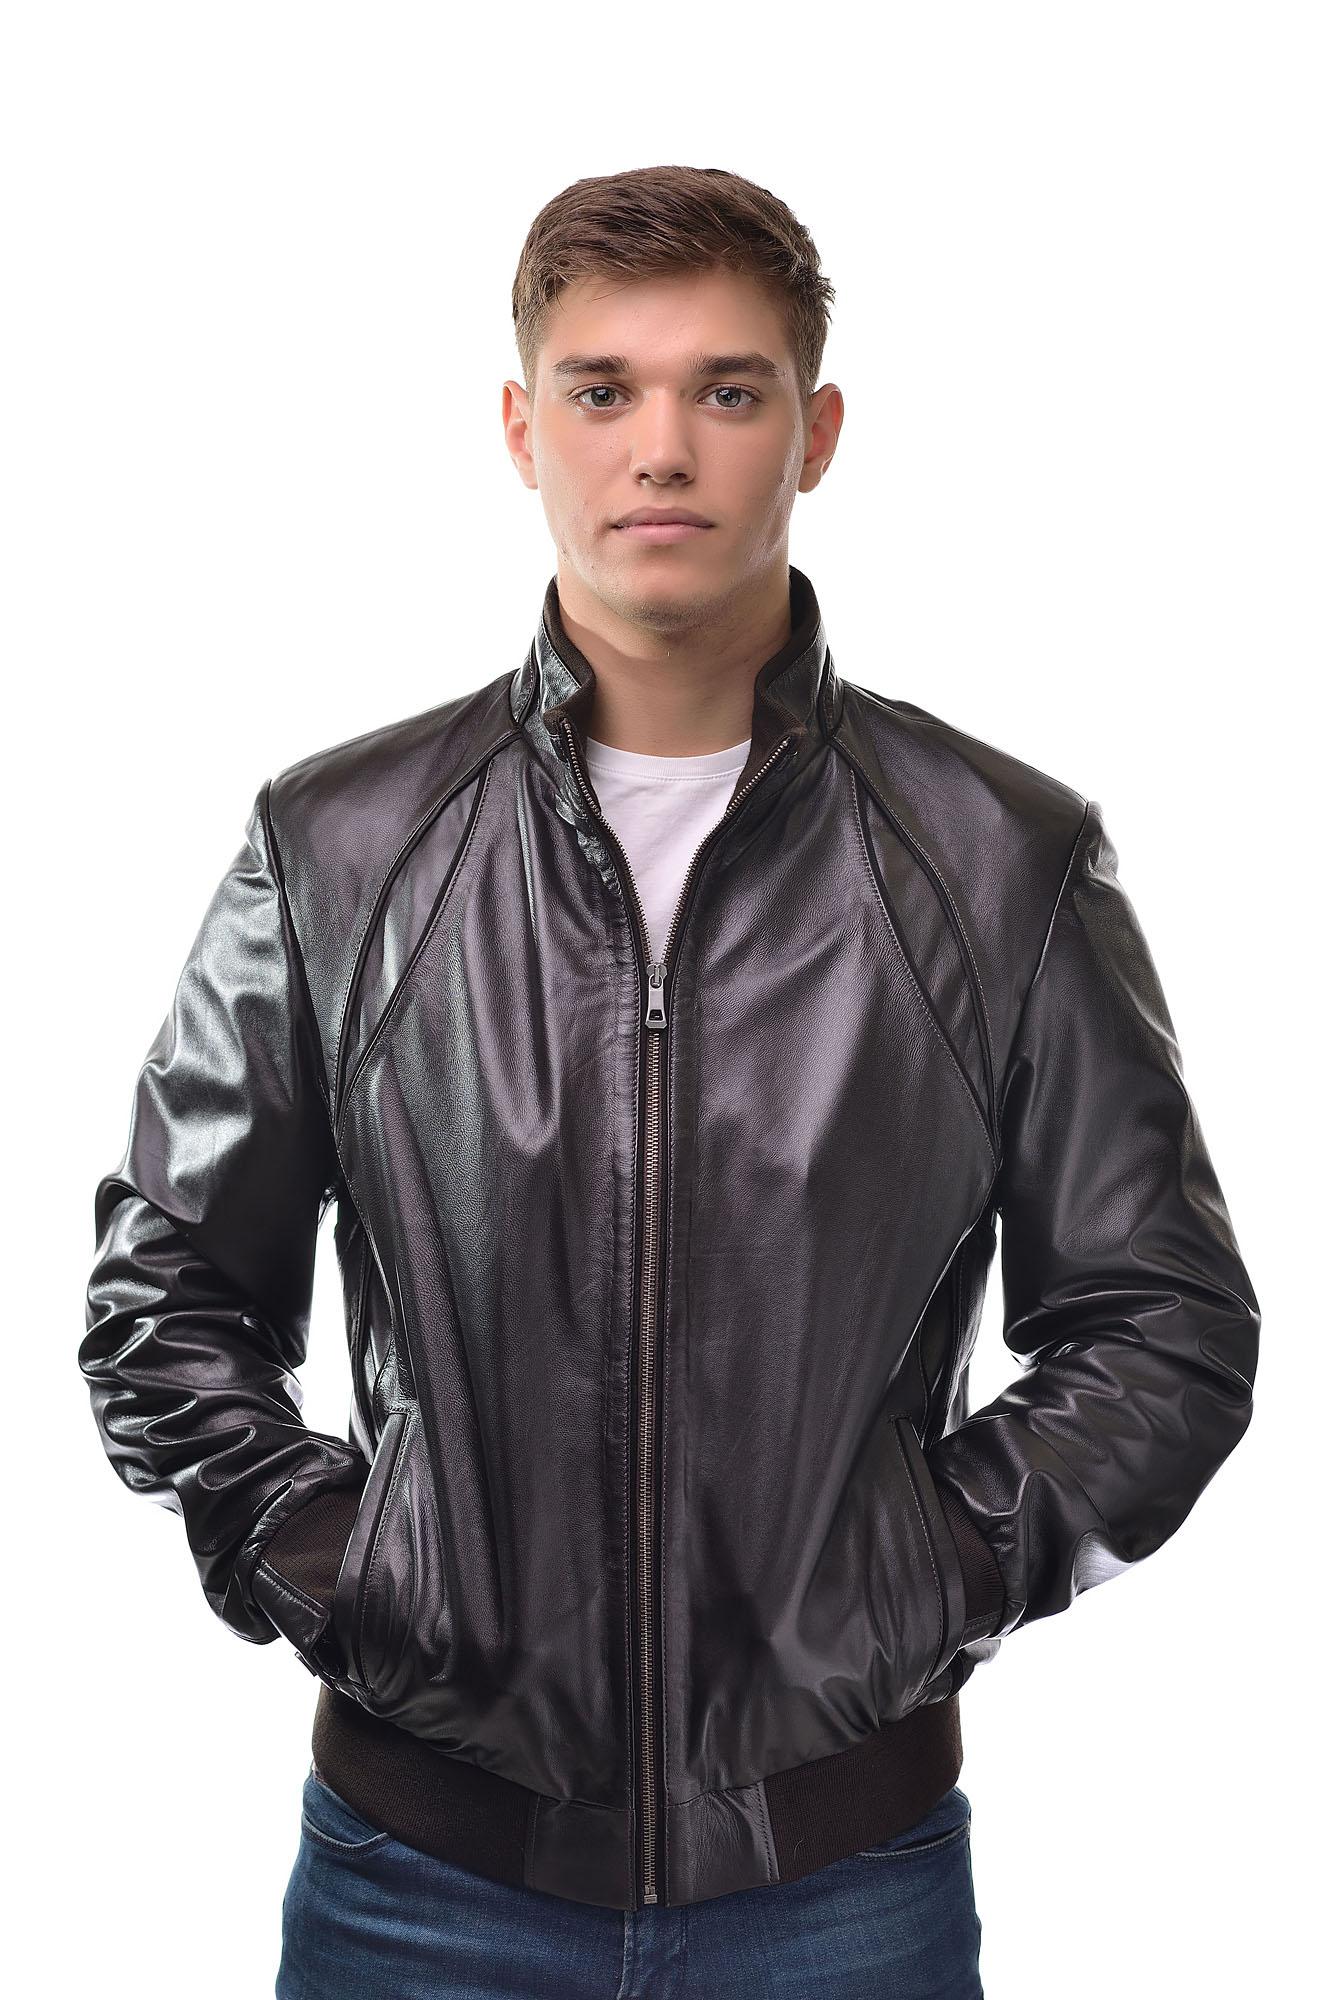 Мужская Кожаная куртка5047